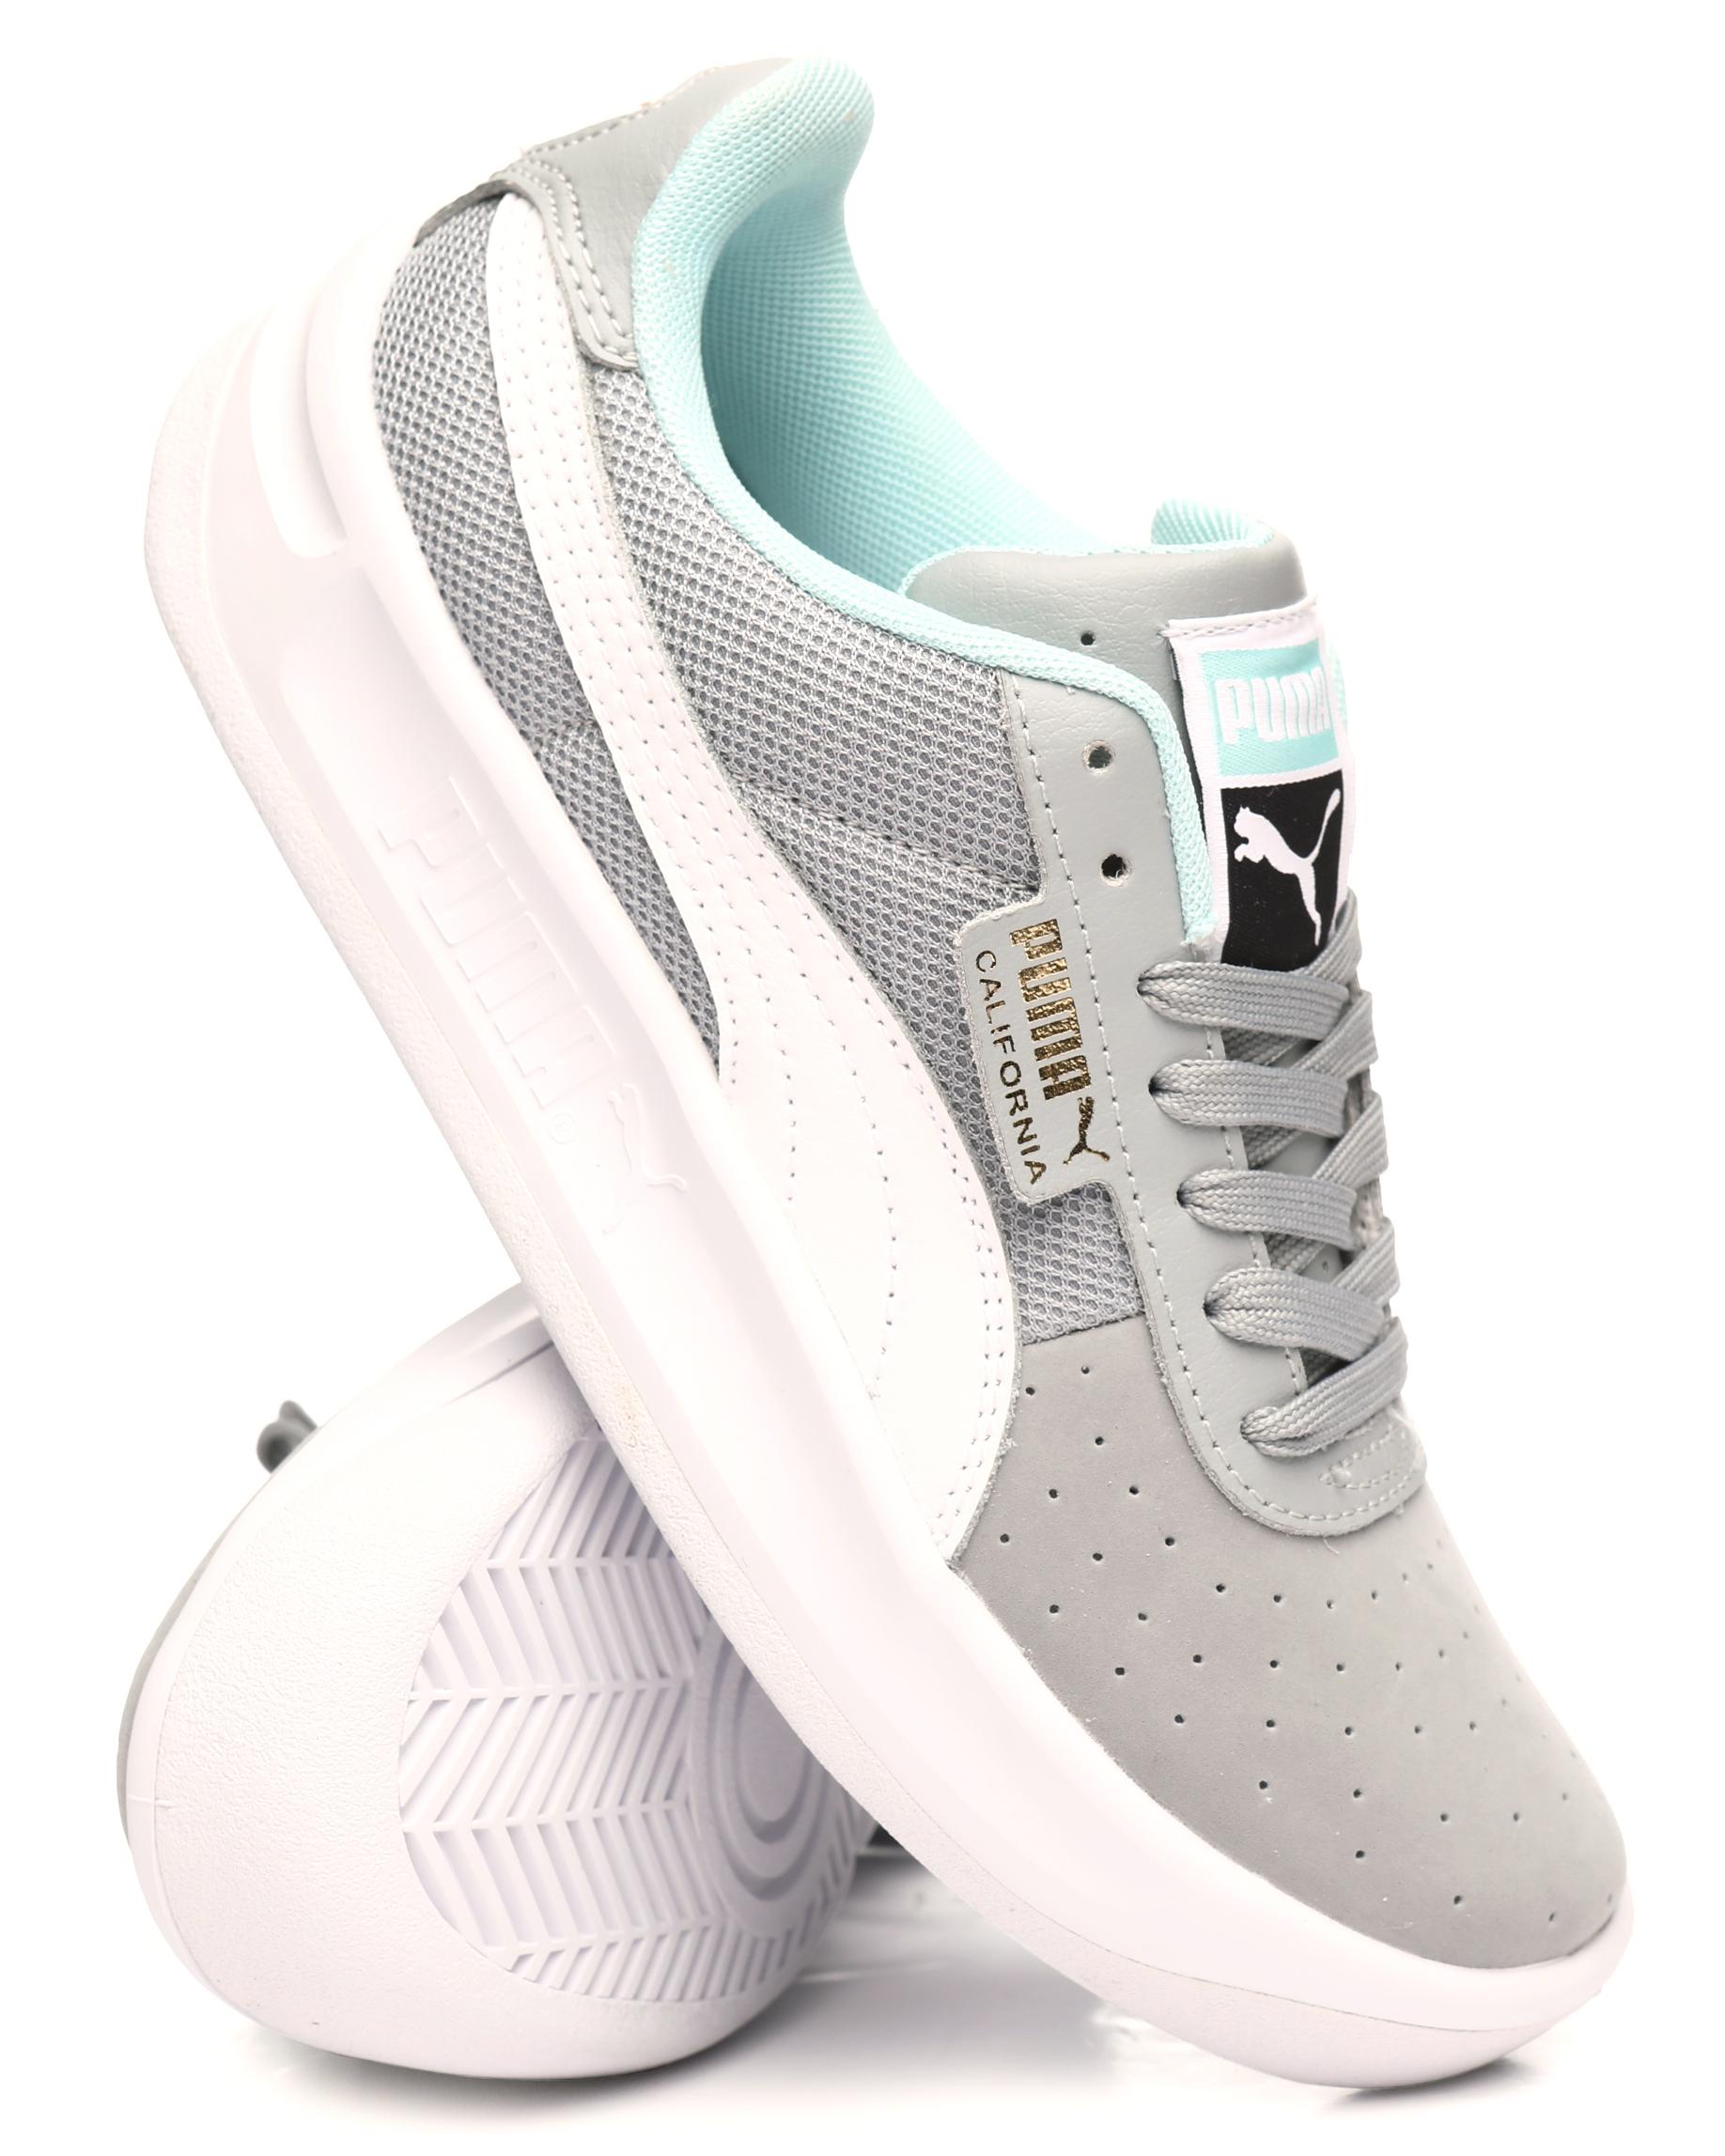 Buy California Casual Jr Sneakers (4-7) Boys Footwear from ...